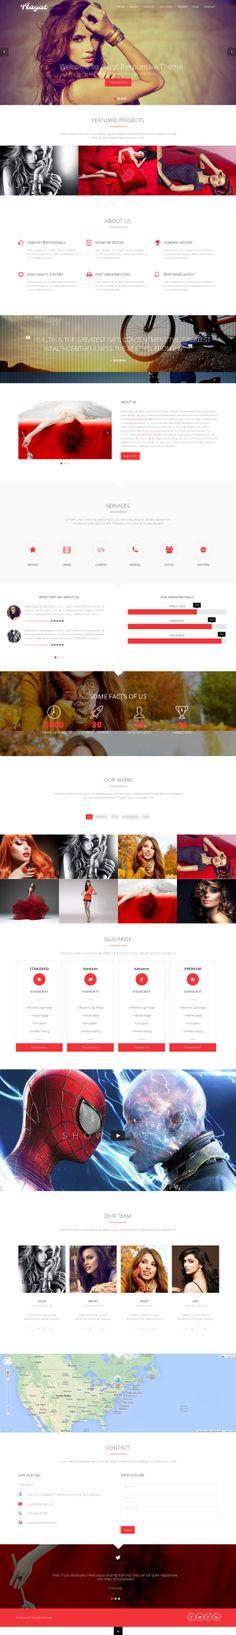 Aayat - Responsive One Page #HTML #Template. More info http://themeforest.net/item/aayat-responsive-one-page-multipurpose-parallax/7820229?ref=ubaidullahbutt